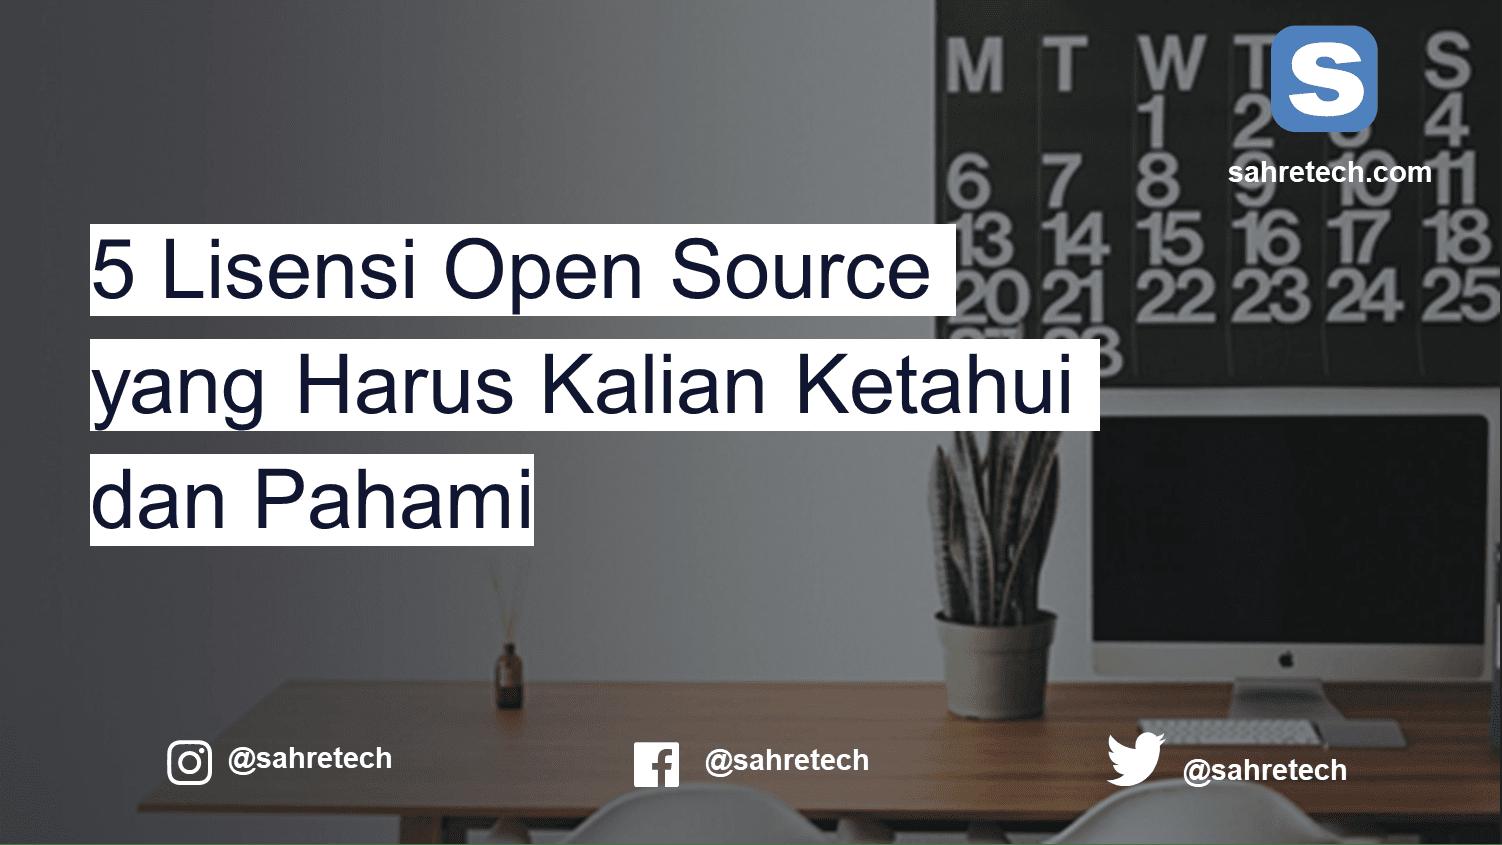 5 lisensi open source yang wajib diketahui anak IT